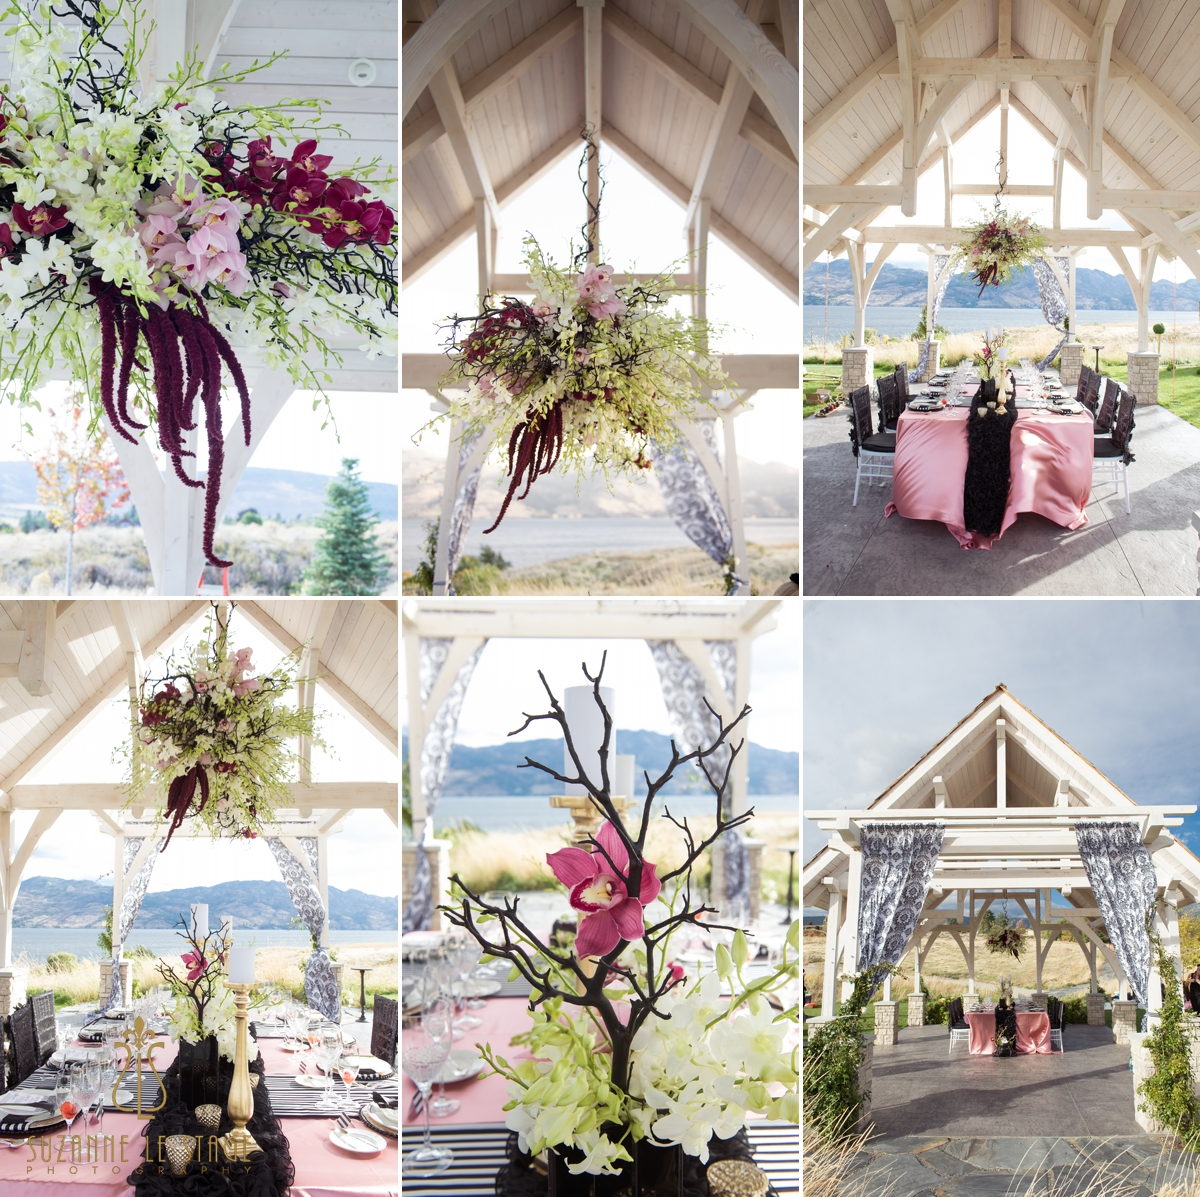 Mary Poppins Kelowna Okanagan Photography Wedding Photographer Suzanne Le  Stage Sanctuary Gardens